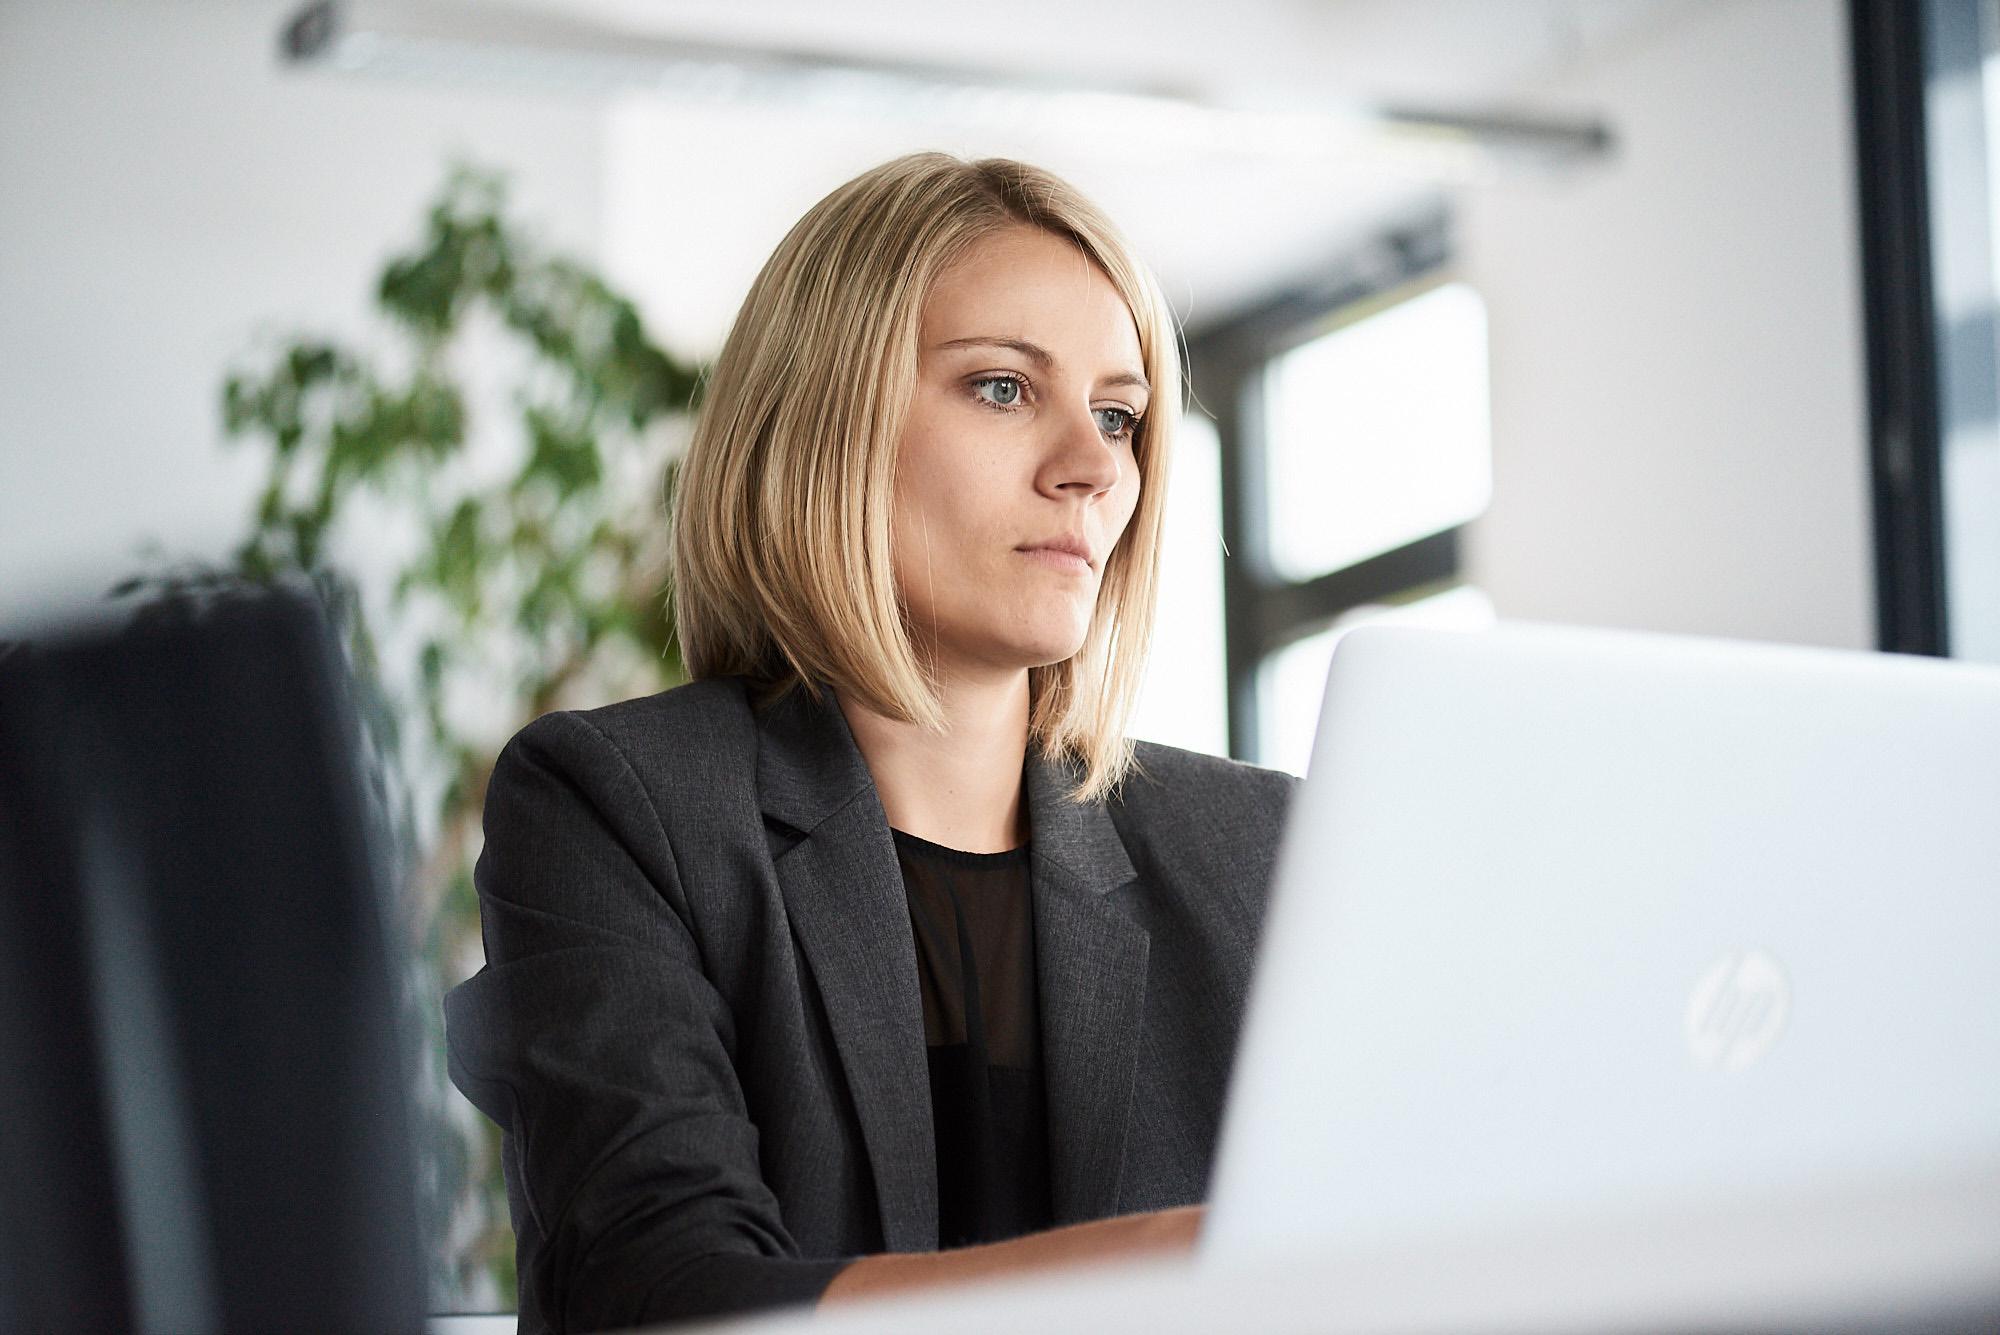 Unternehmensfoto Frau am Laptop, Businessfotografie